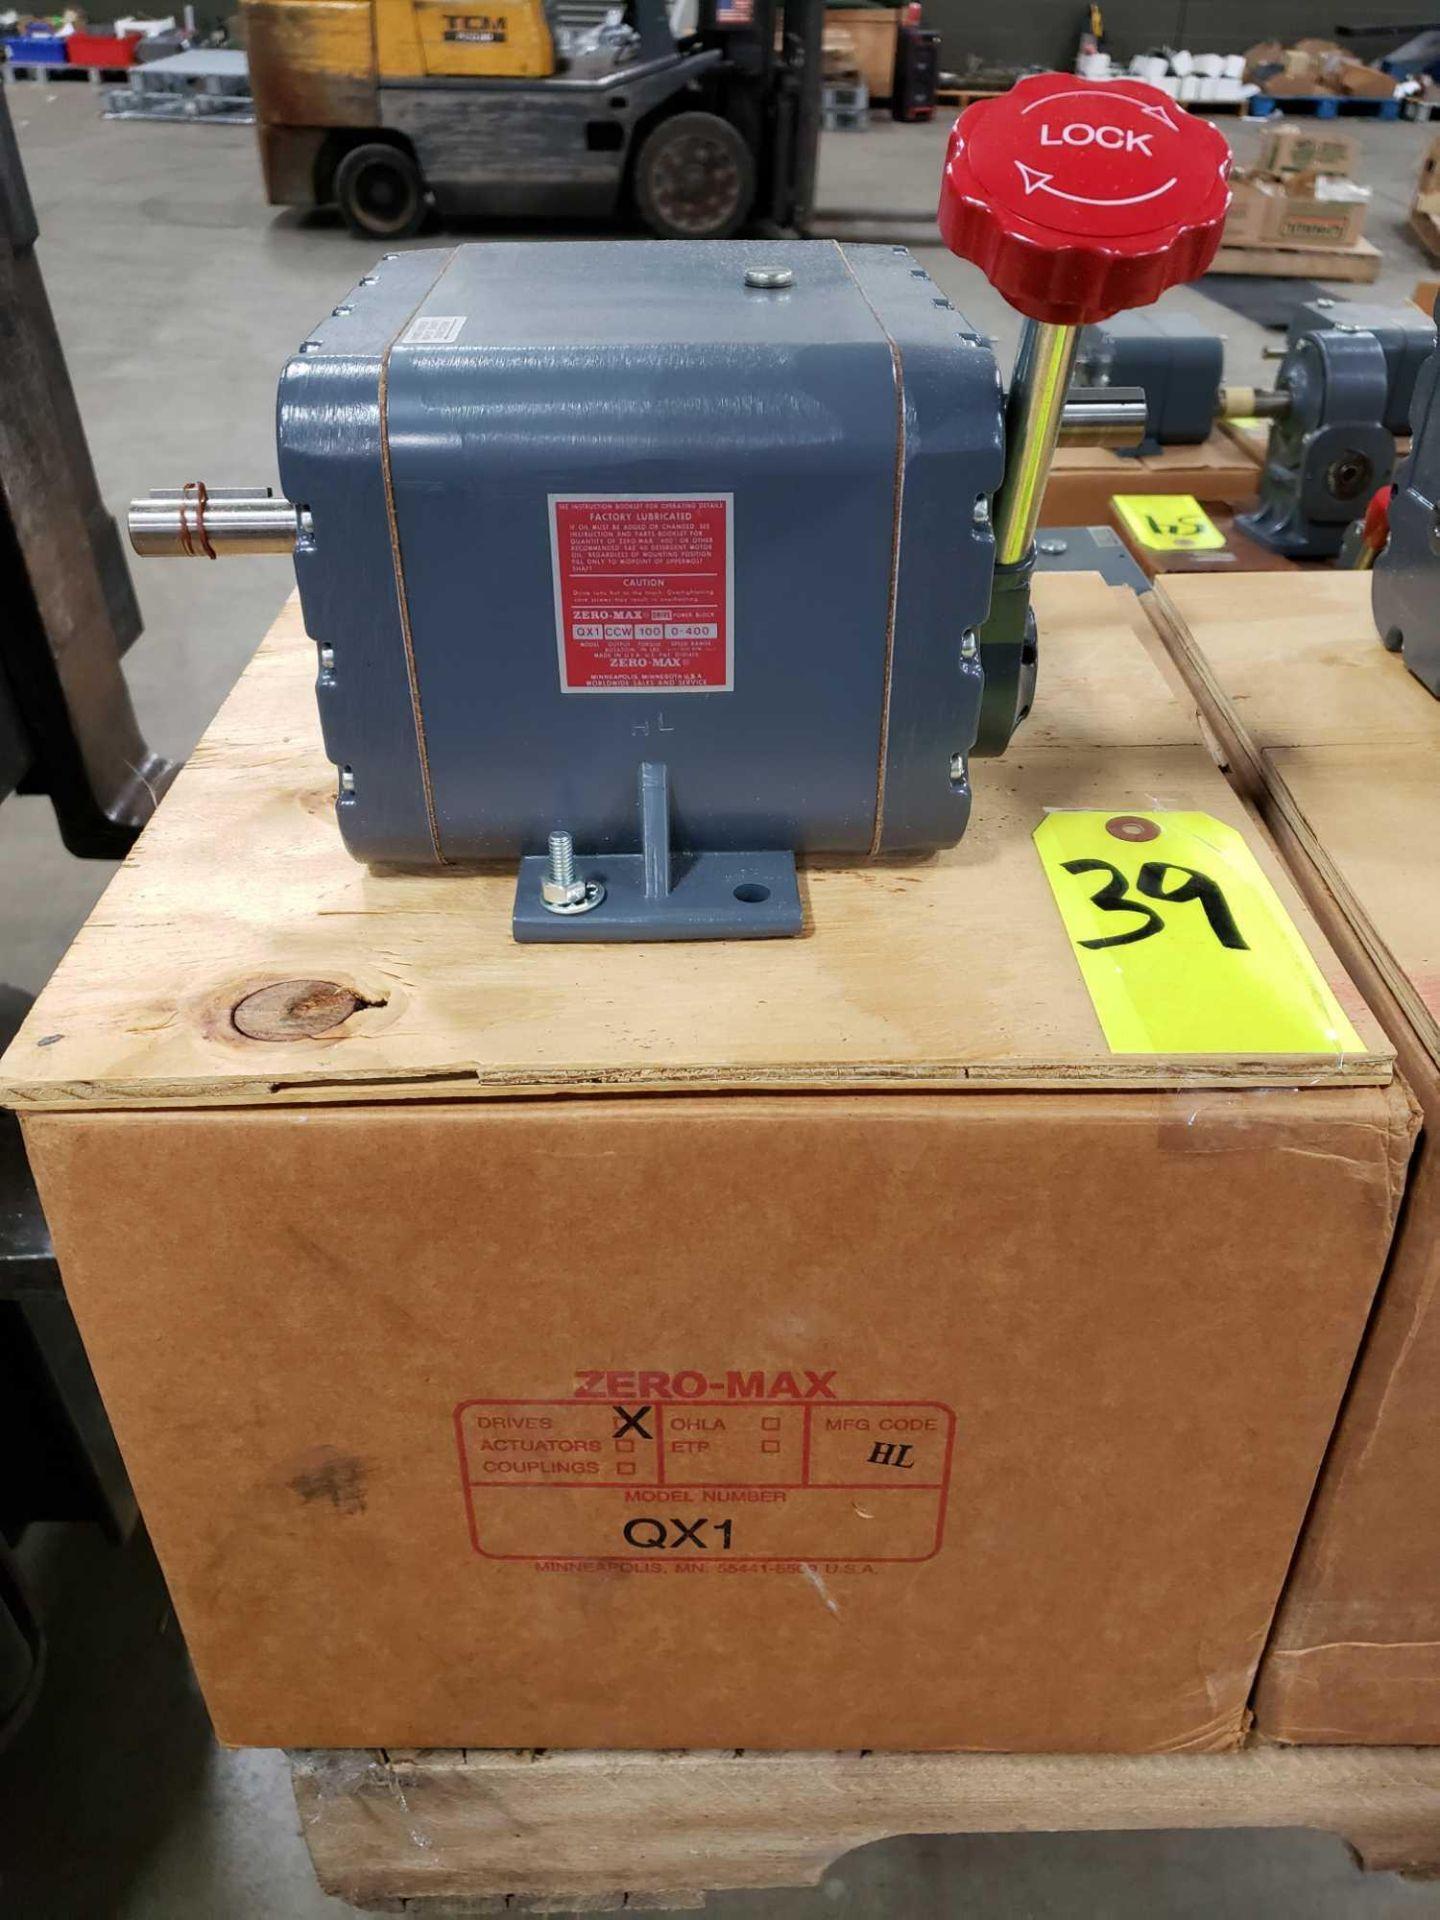 Lot 39 - Zero-max drive power block model QX1 CCW output rotation, 100lb torque, 0-400 speed range. New.